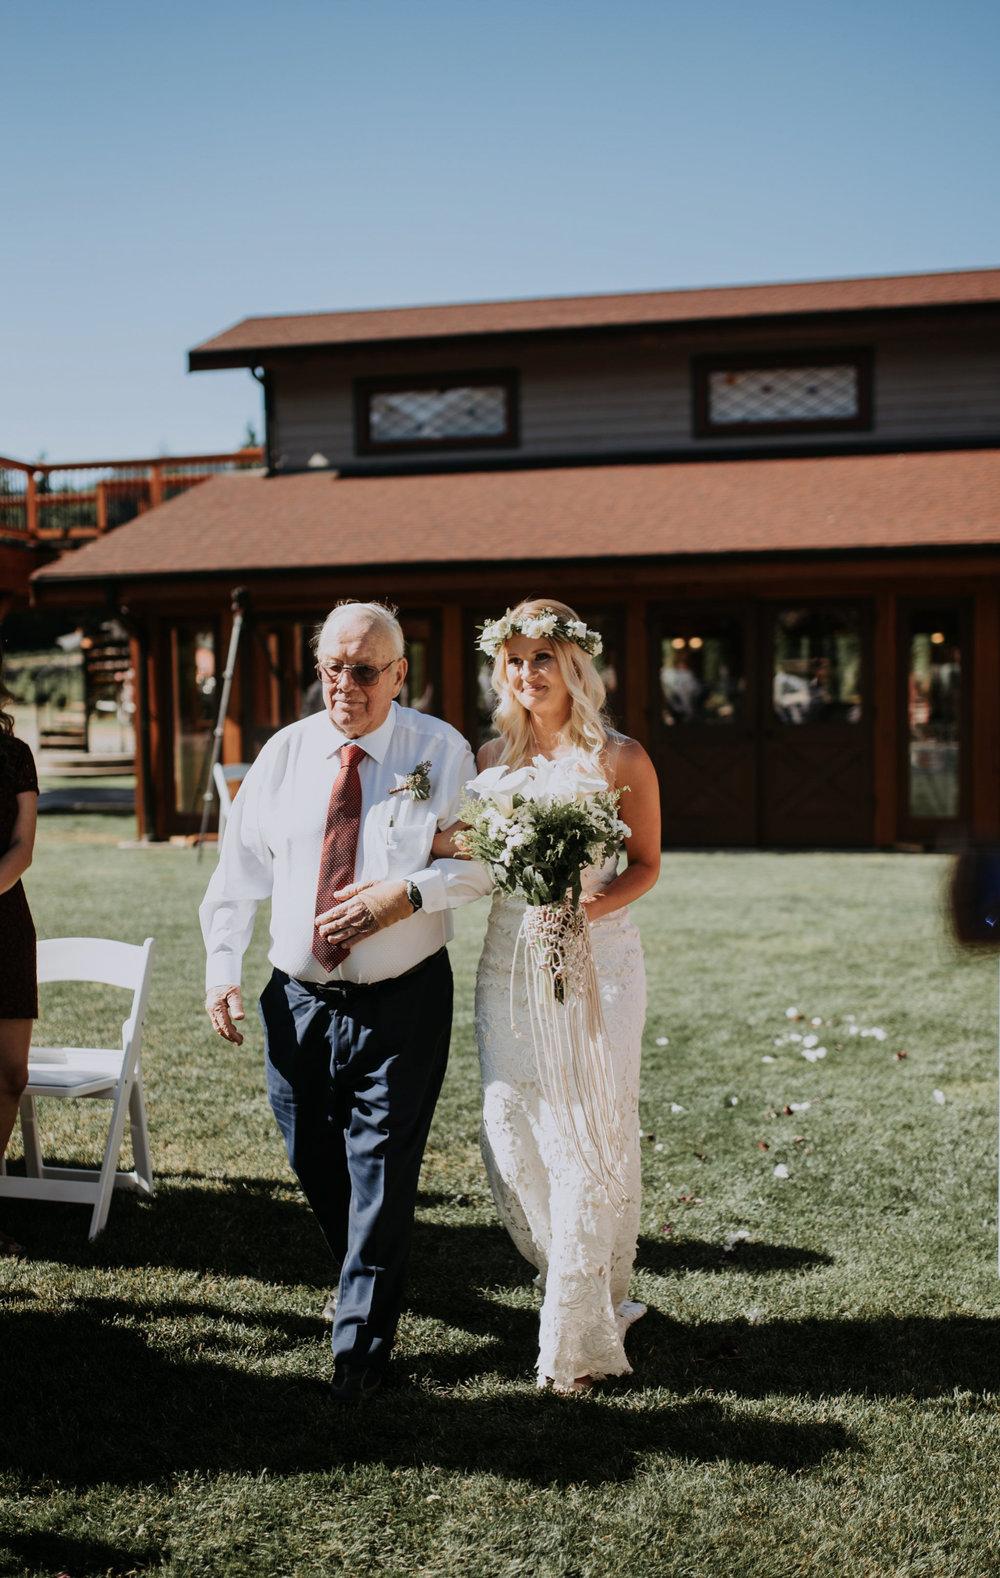 trinity-tree-farm-issaquah-washington-wedding-seattle-lifestyle-photographer-caitlyn-nikula-photography-68.jpg